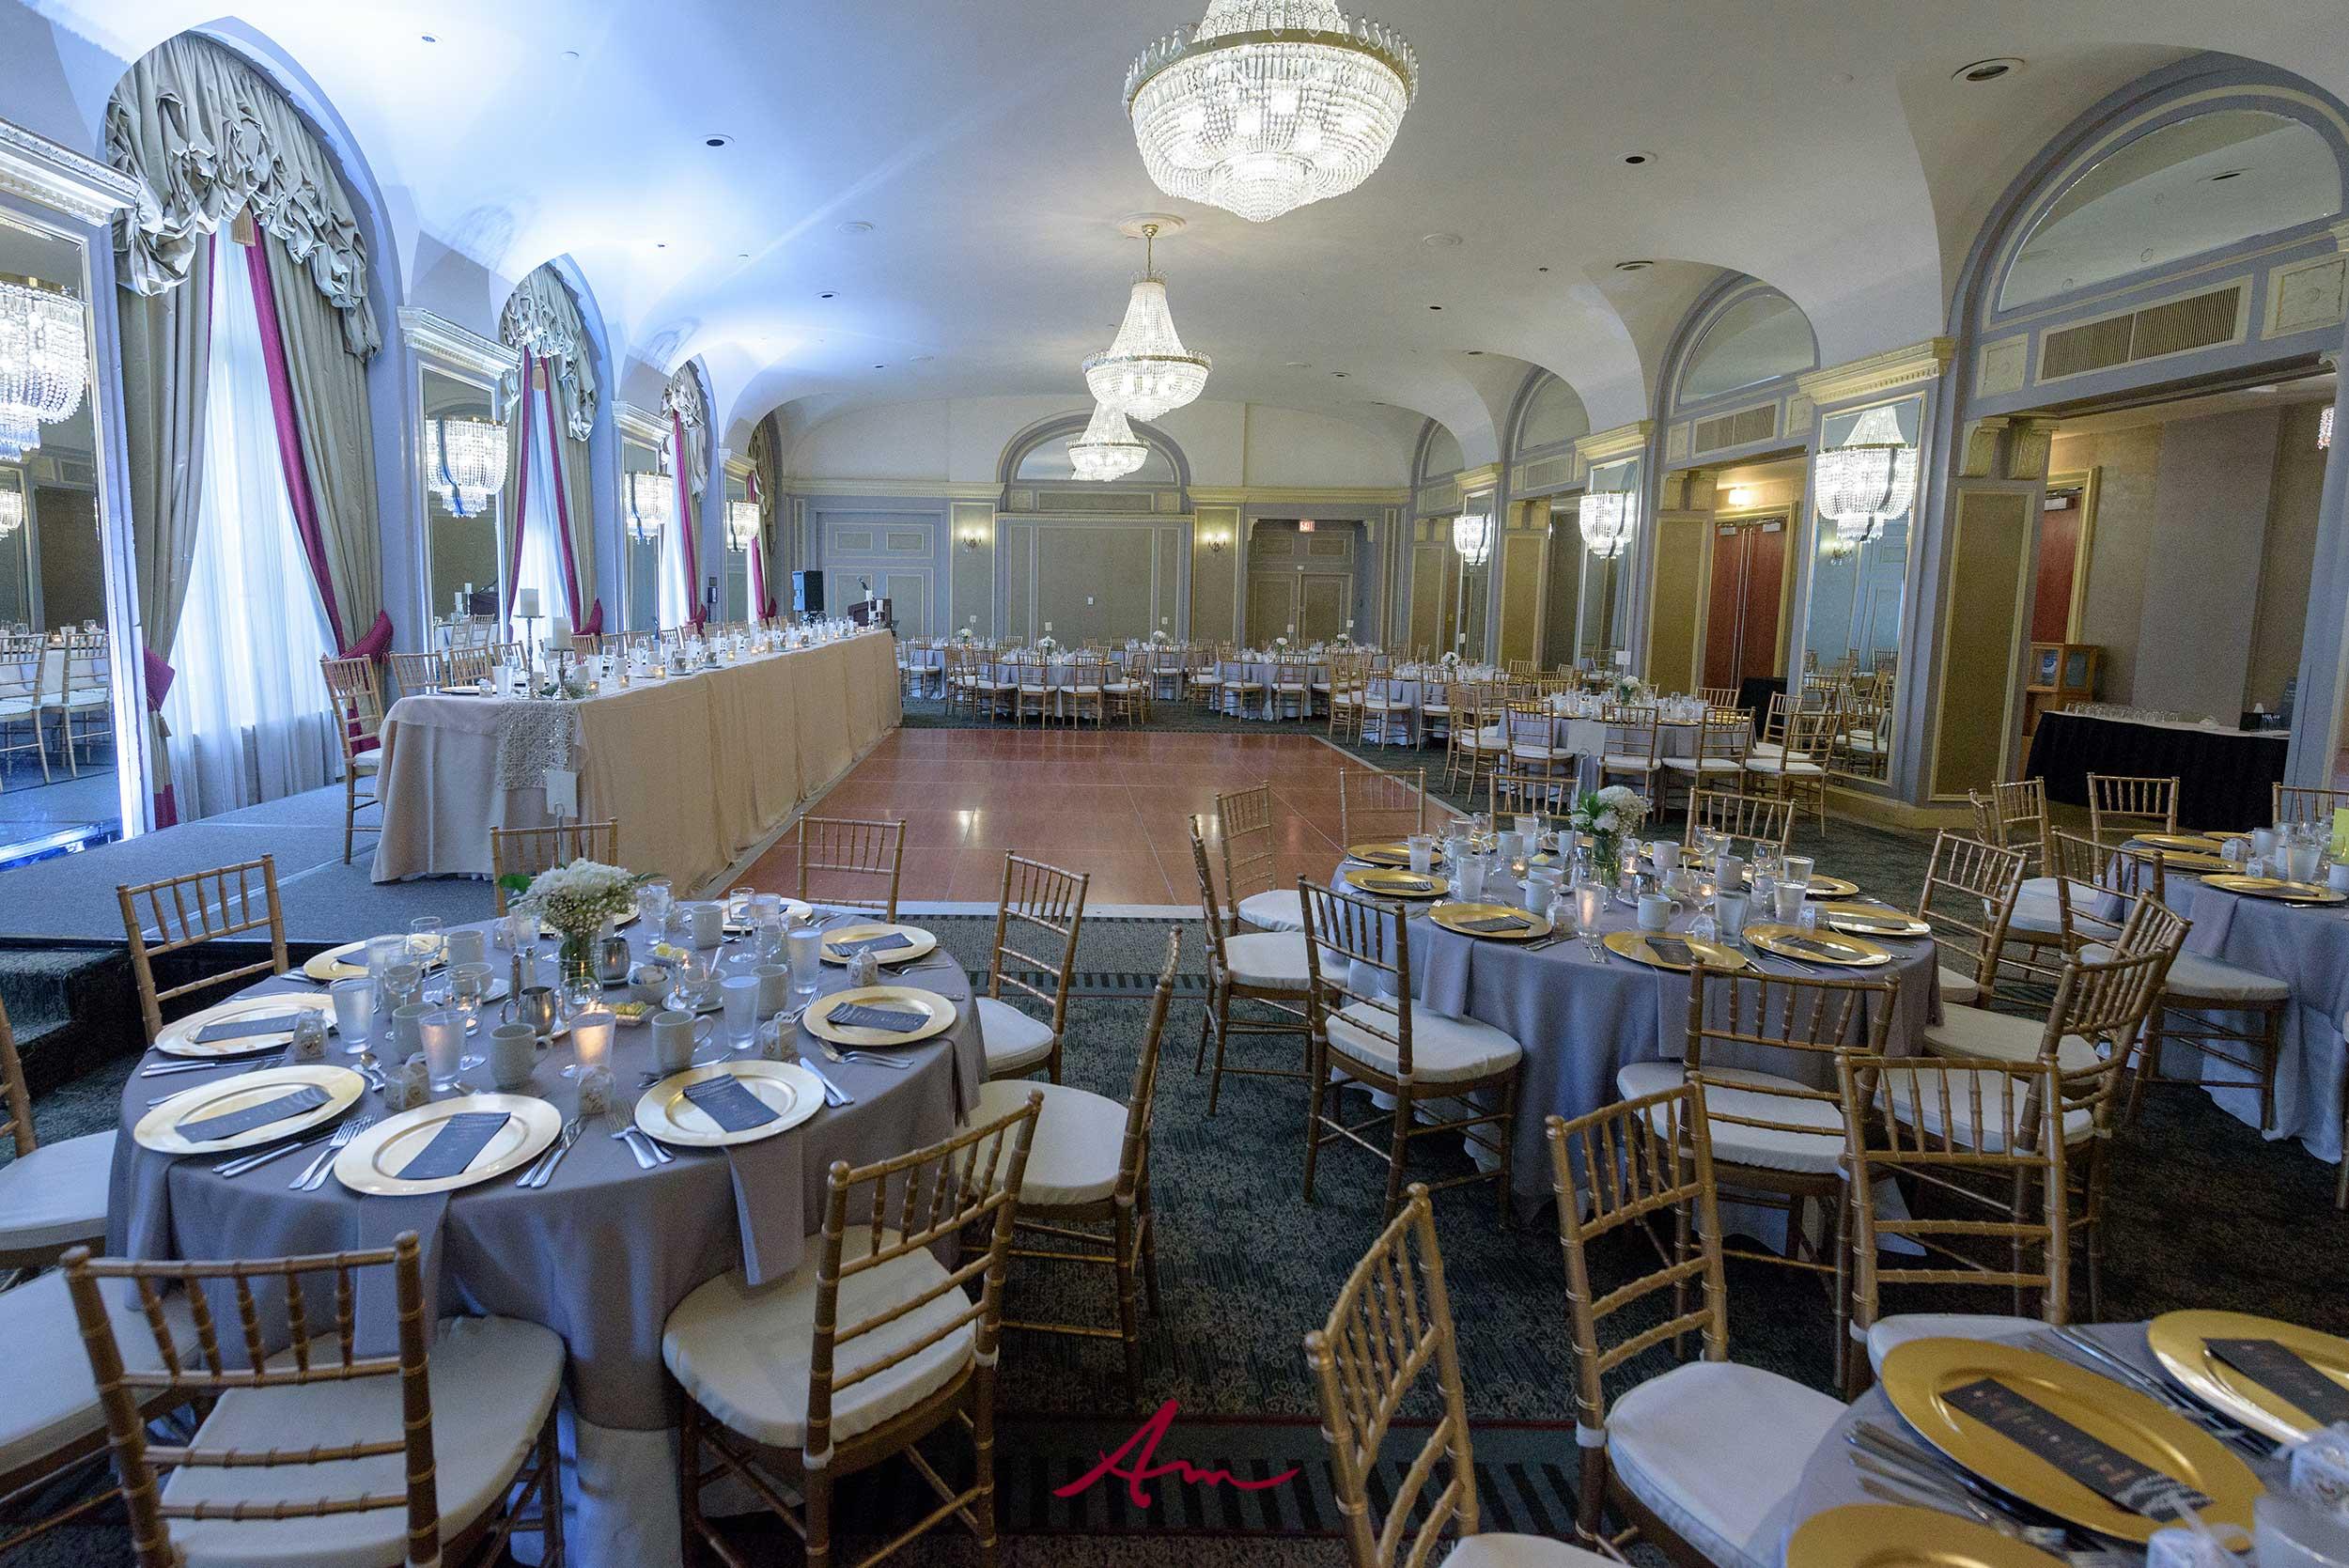 westin-atlantic-ballroom-wedding.jpg